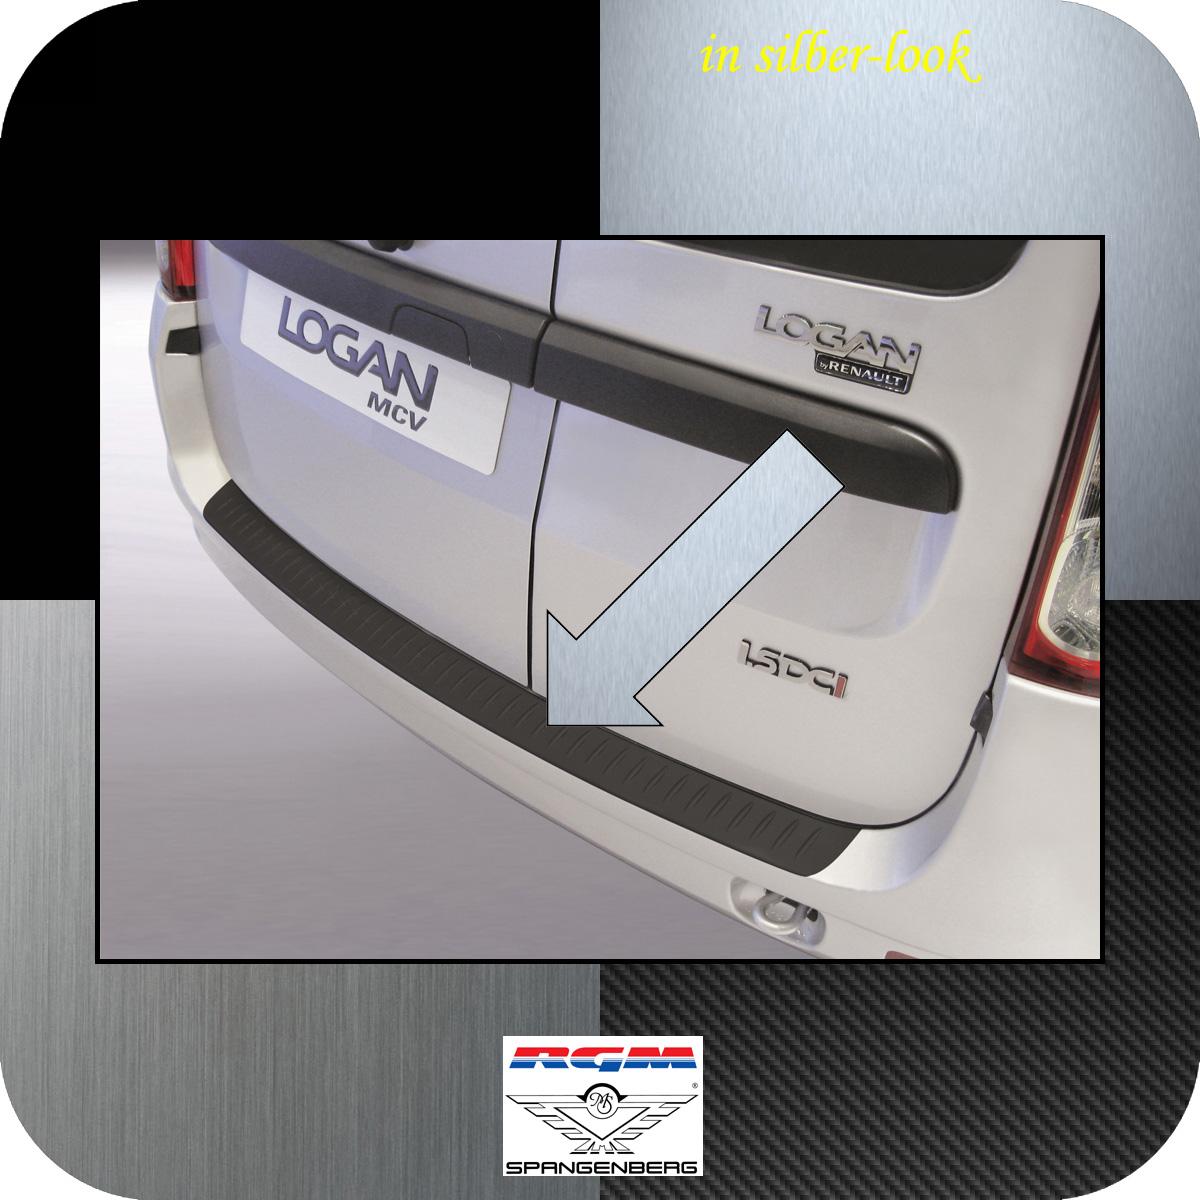 Ladekantenschutz Silber-Look Dacia Logan MCV I Kombi ab facelift 2009-13 3506314